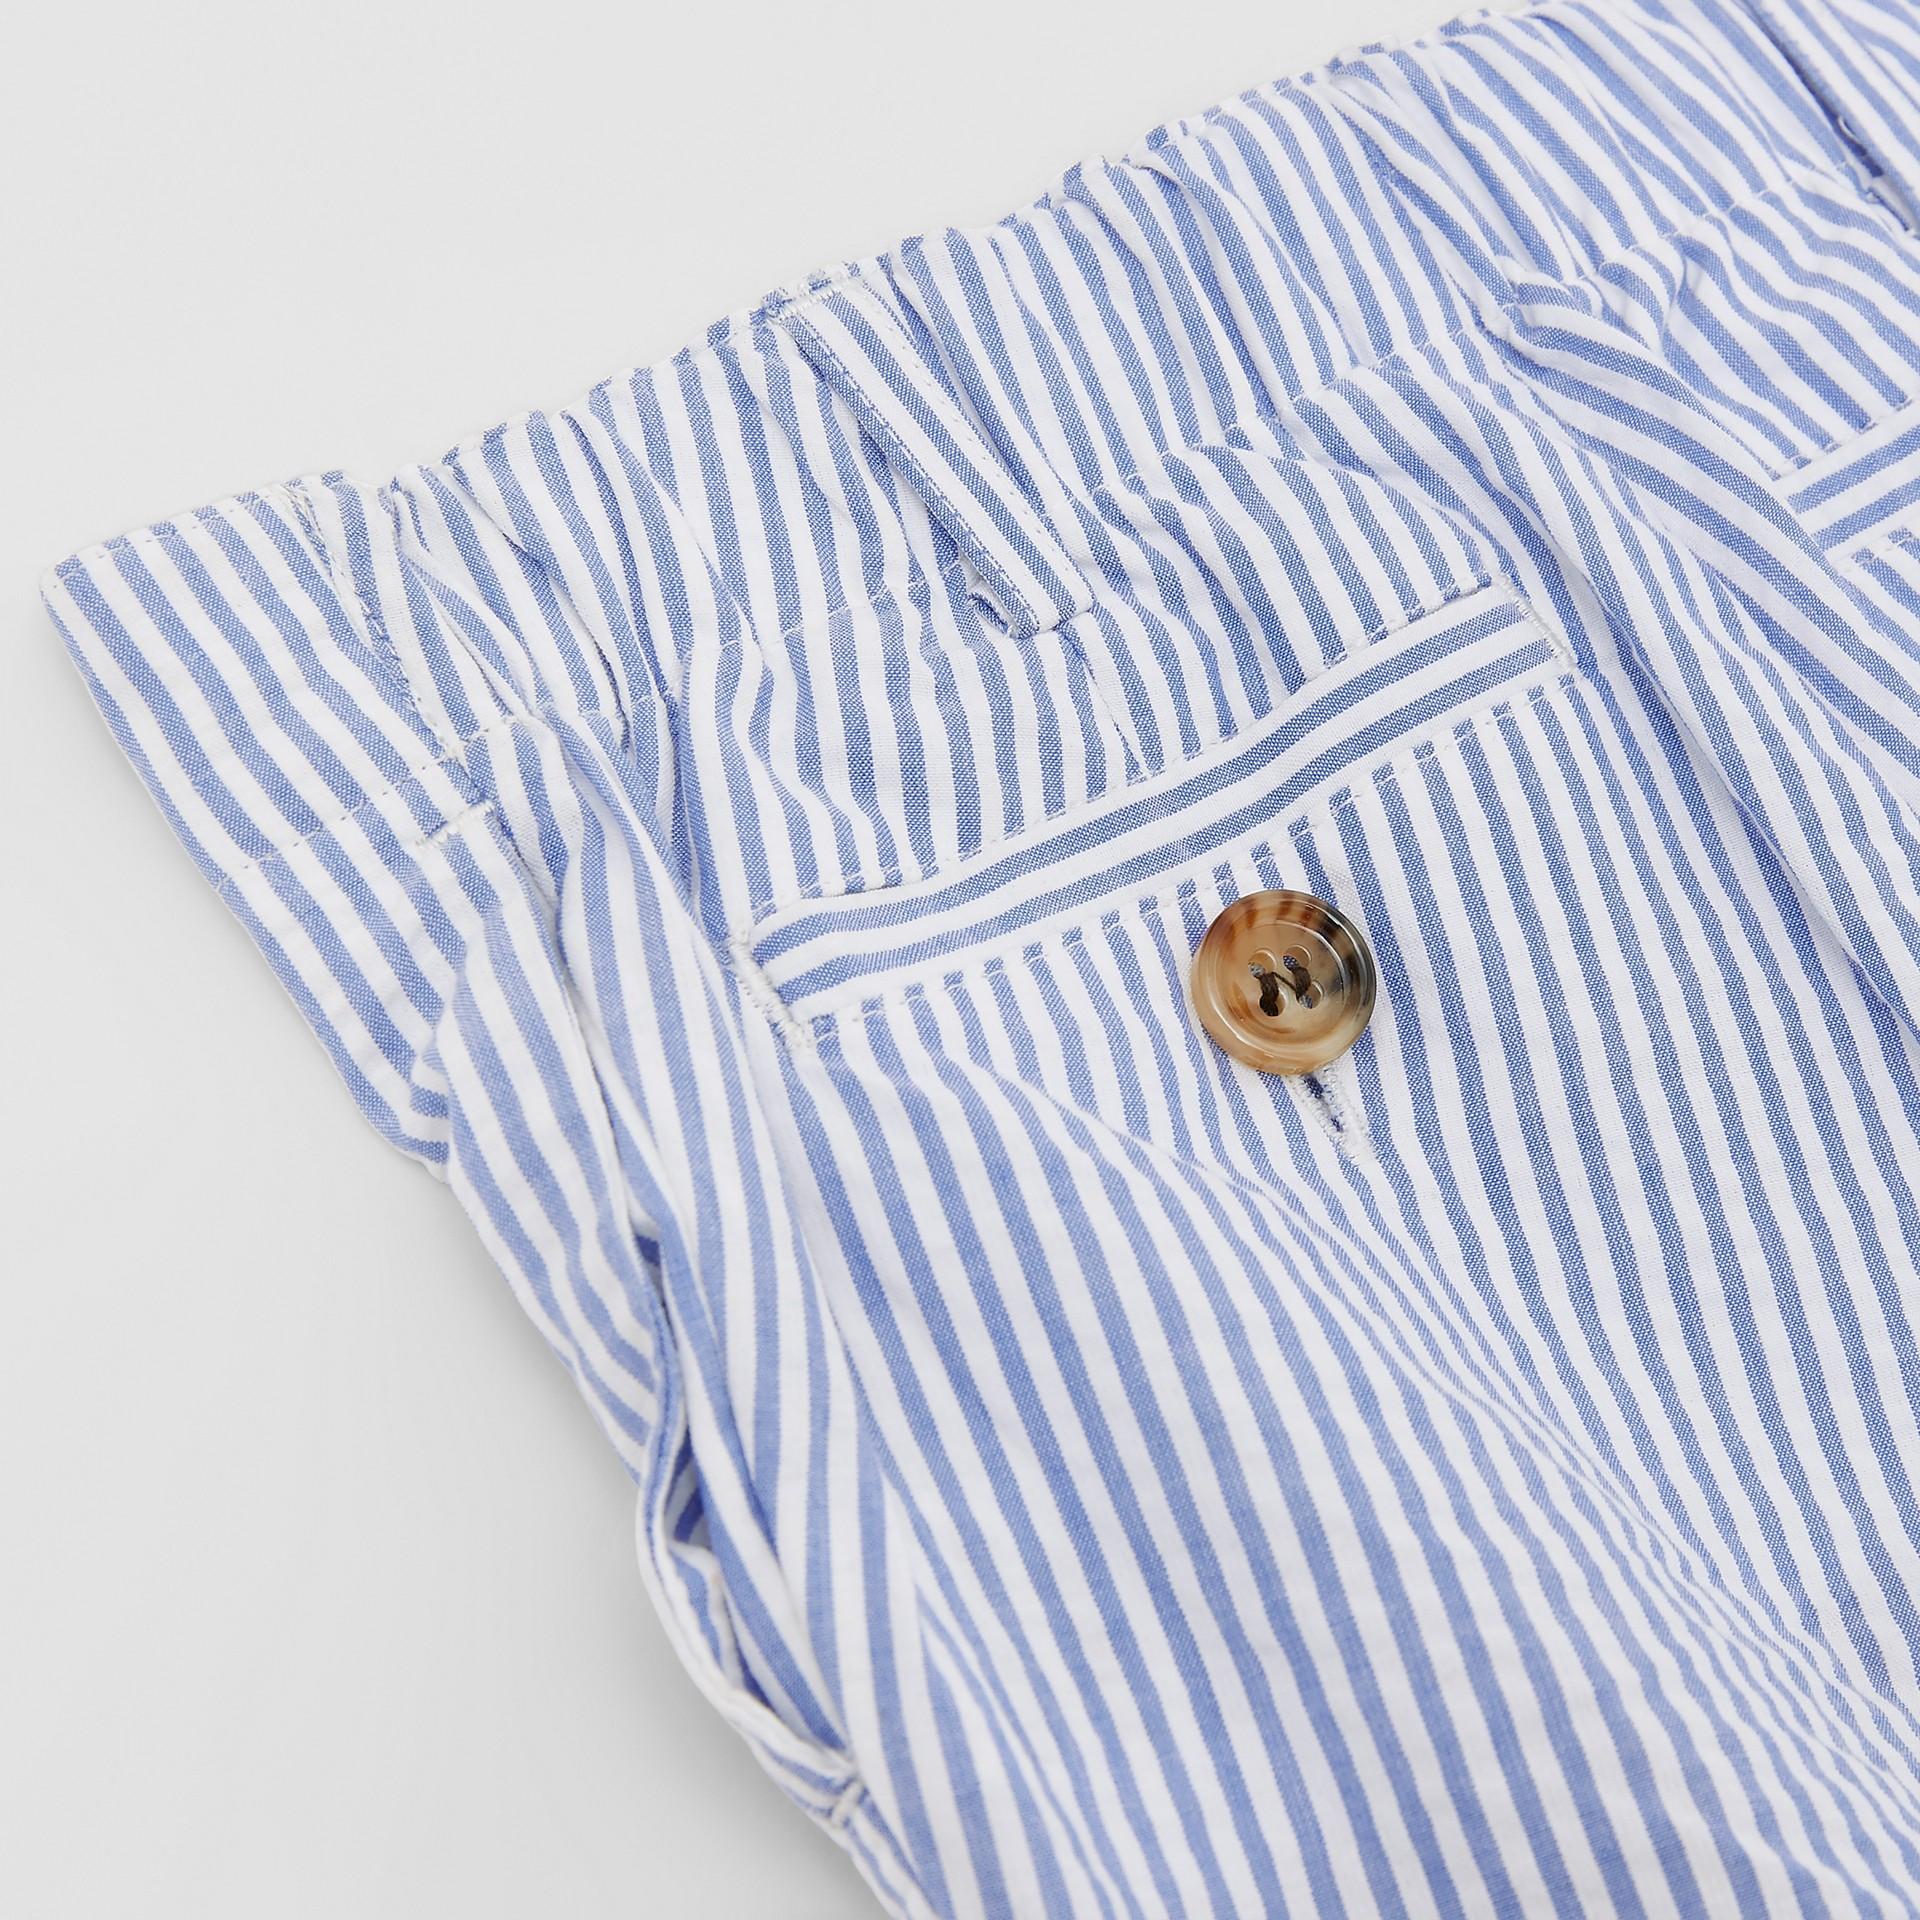 Striped Cotton Seersucker Tailored Trousers in Cornflower Blue - Children | Burberry - gallery image 1